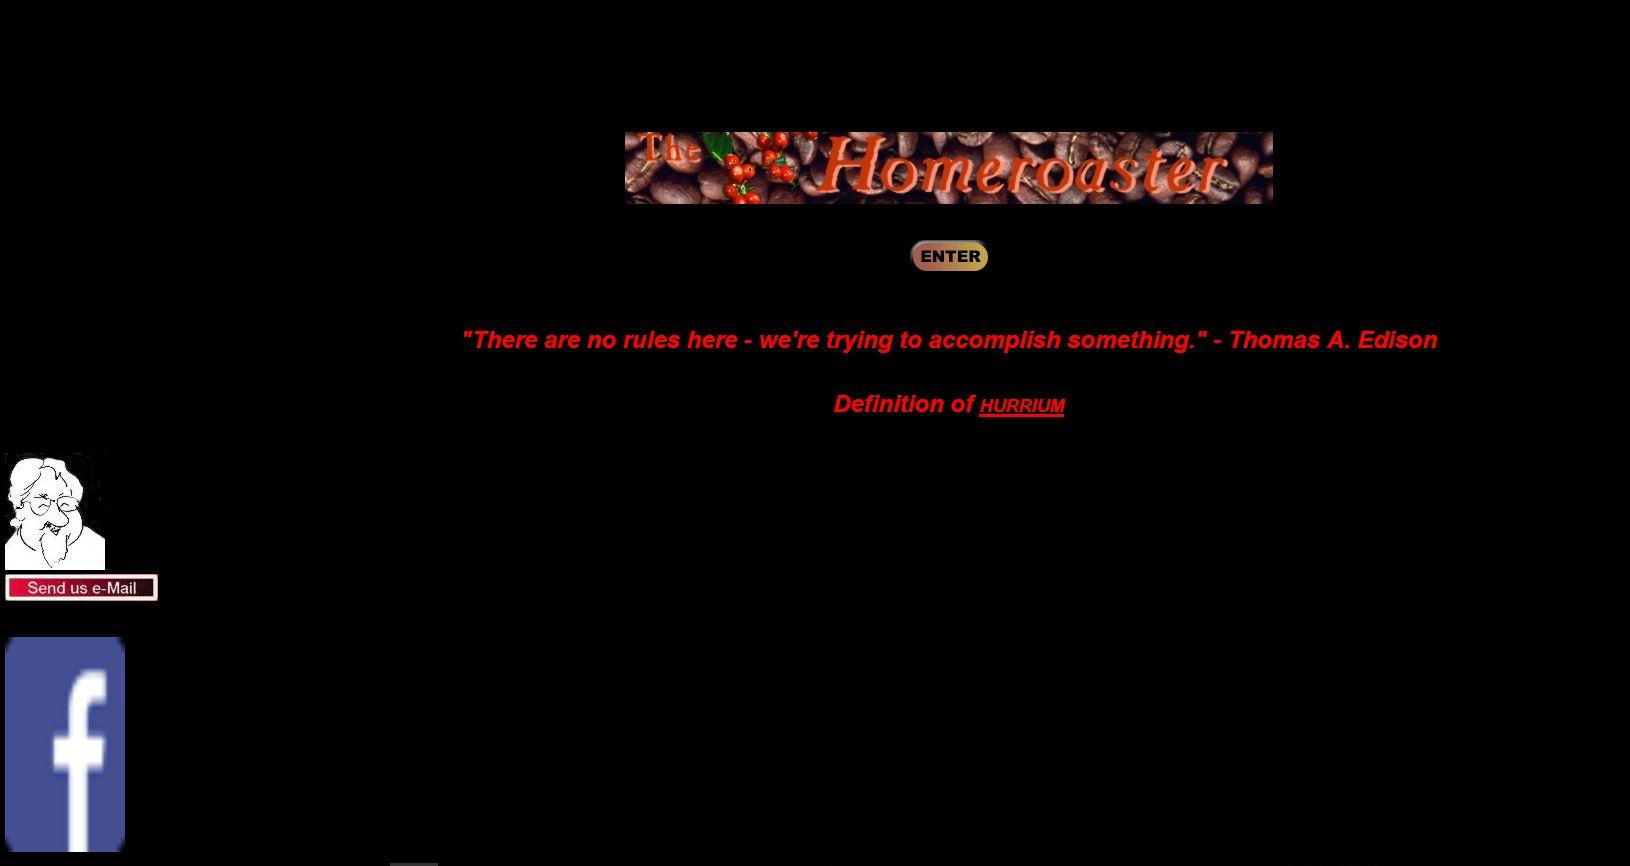 homeroasters.org/forum/attachments/capture_81.jpg